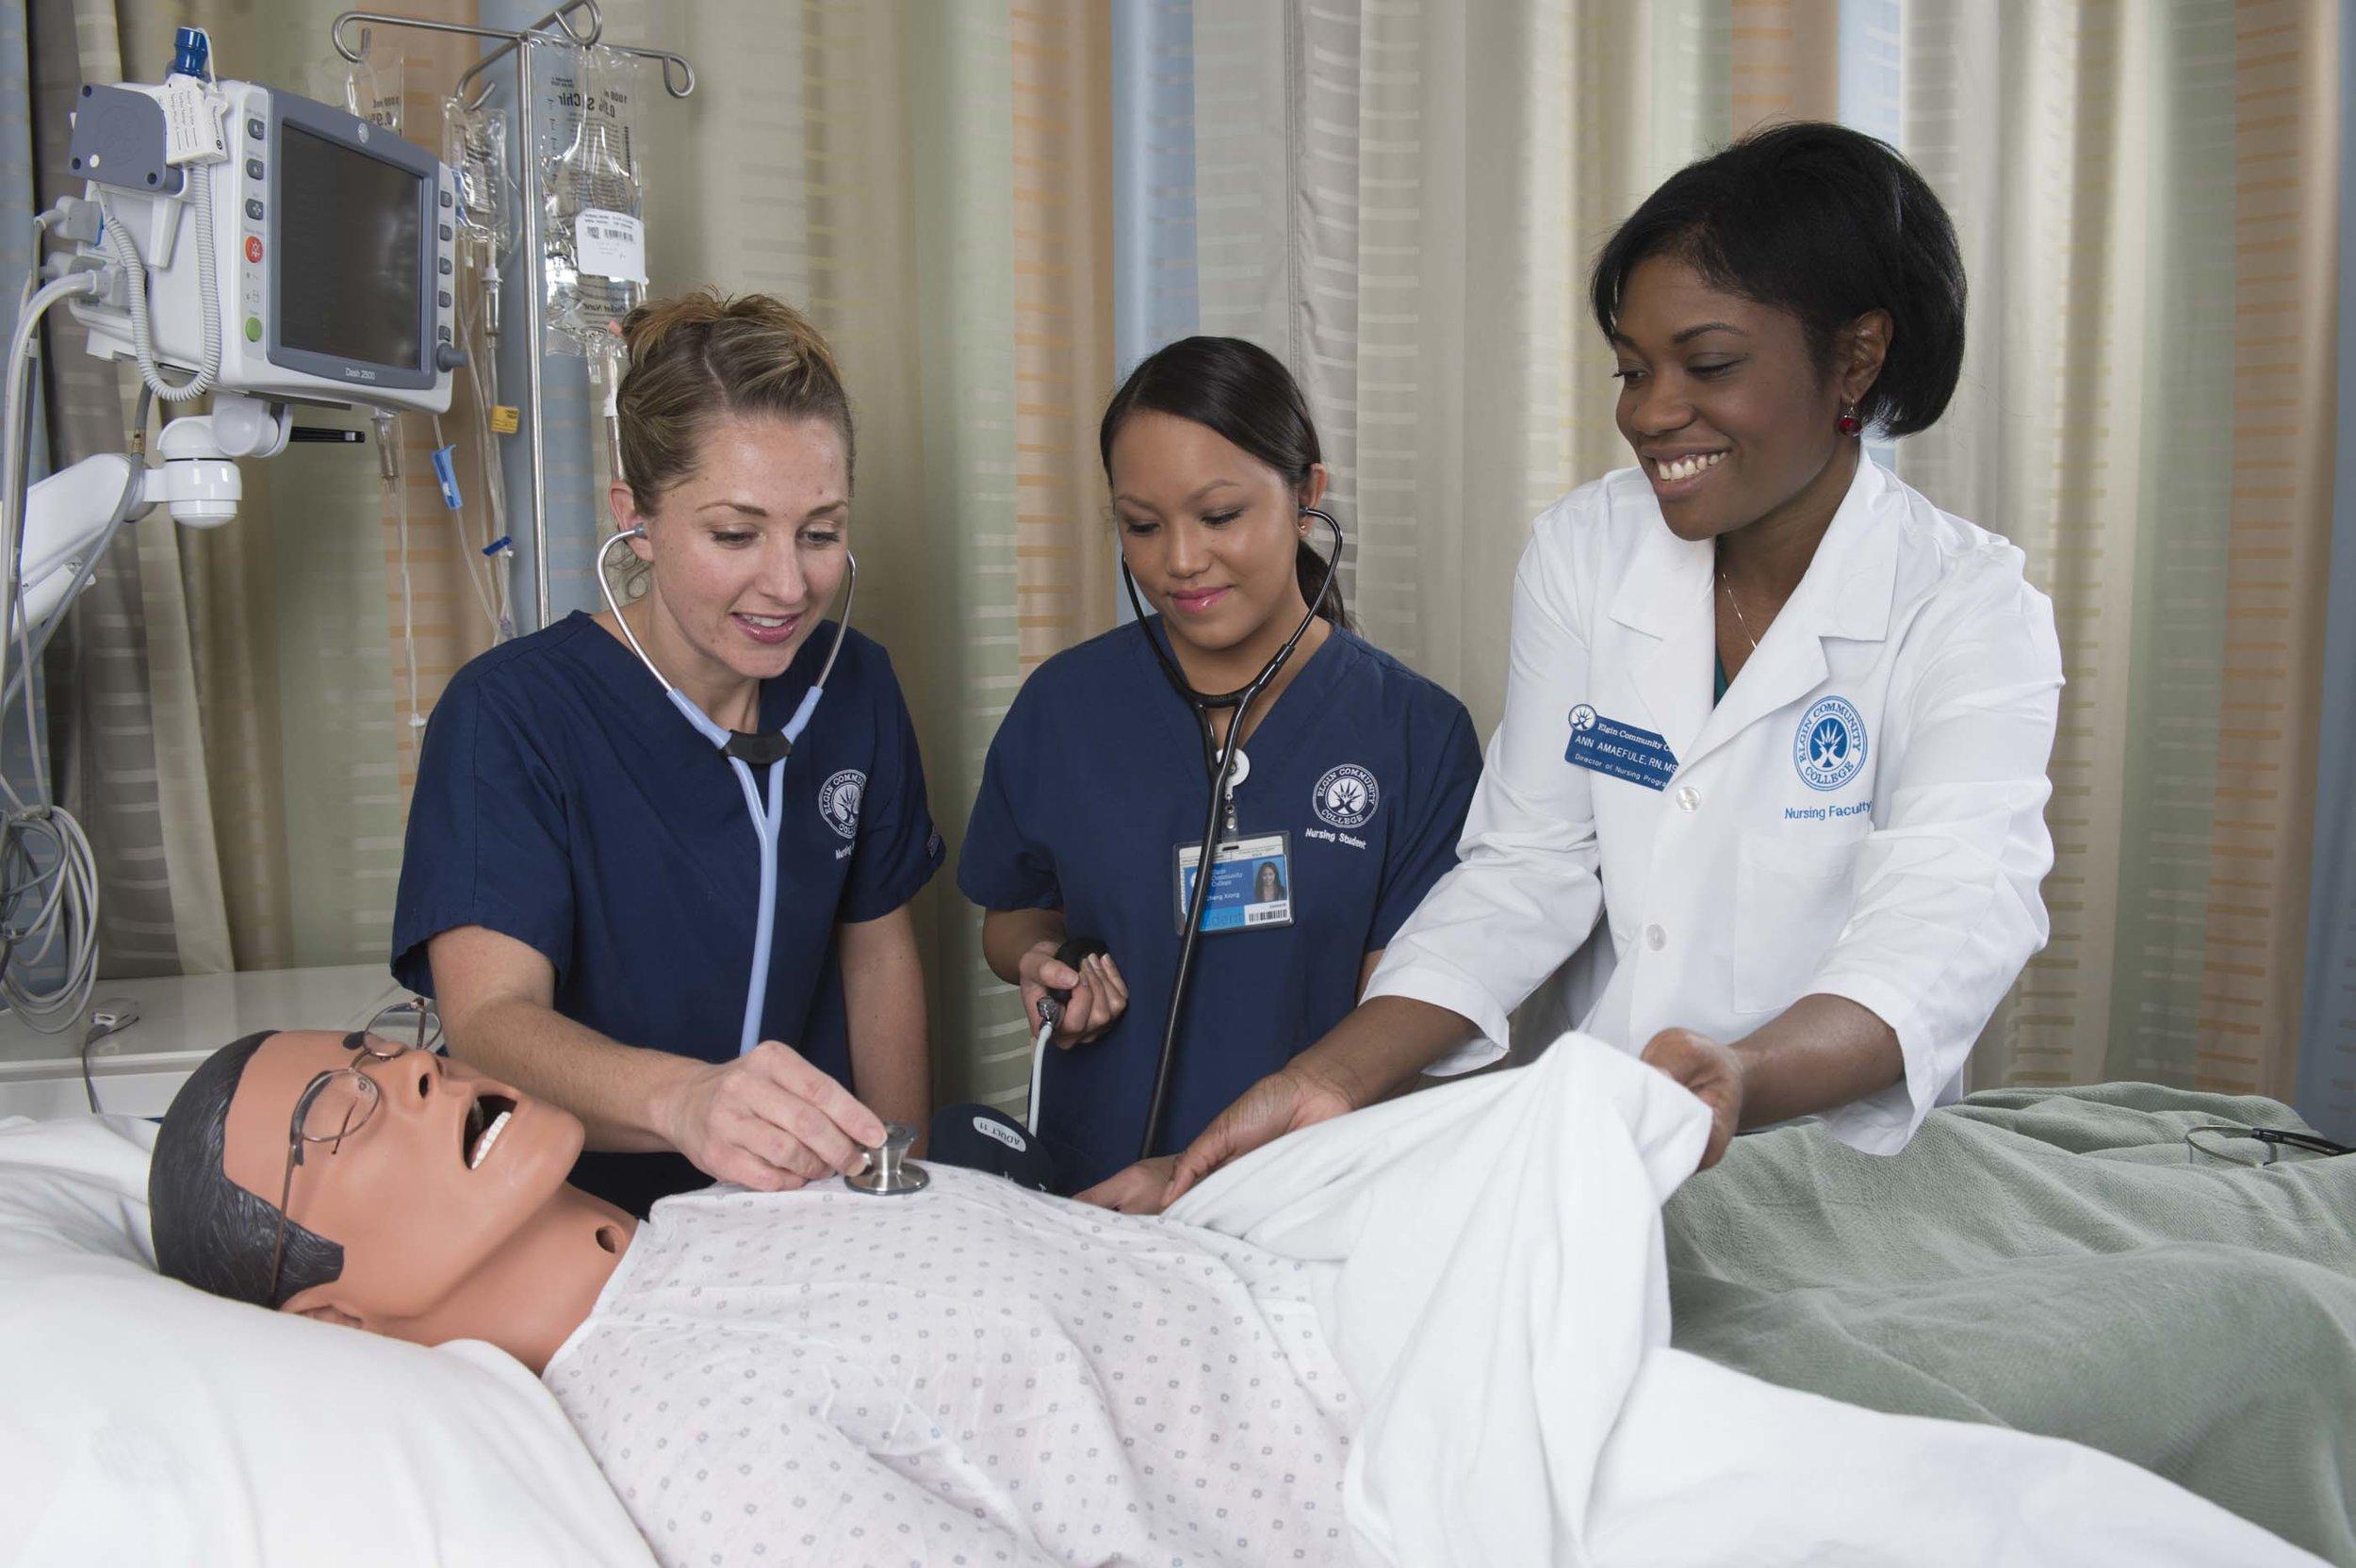 nursing prgram student instructor.jpg